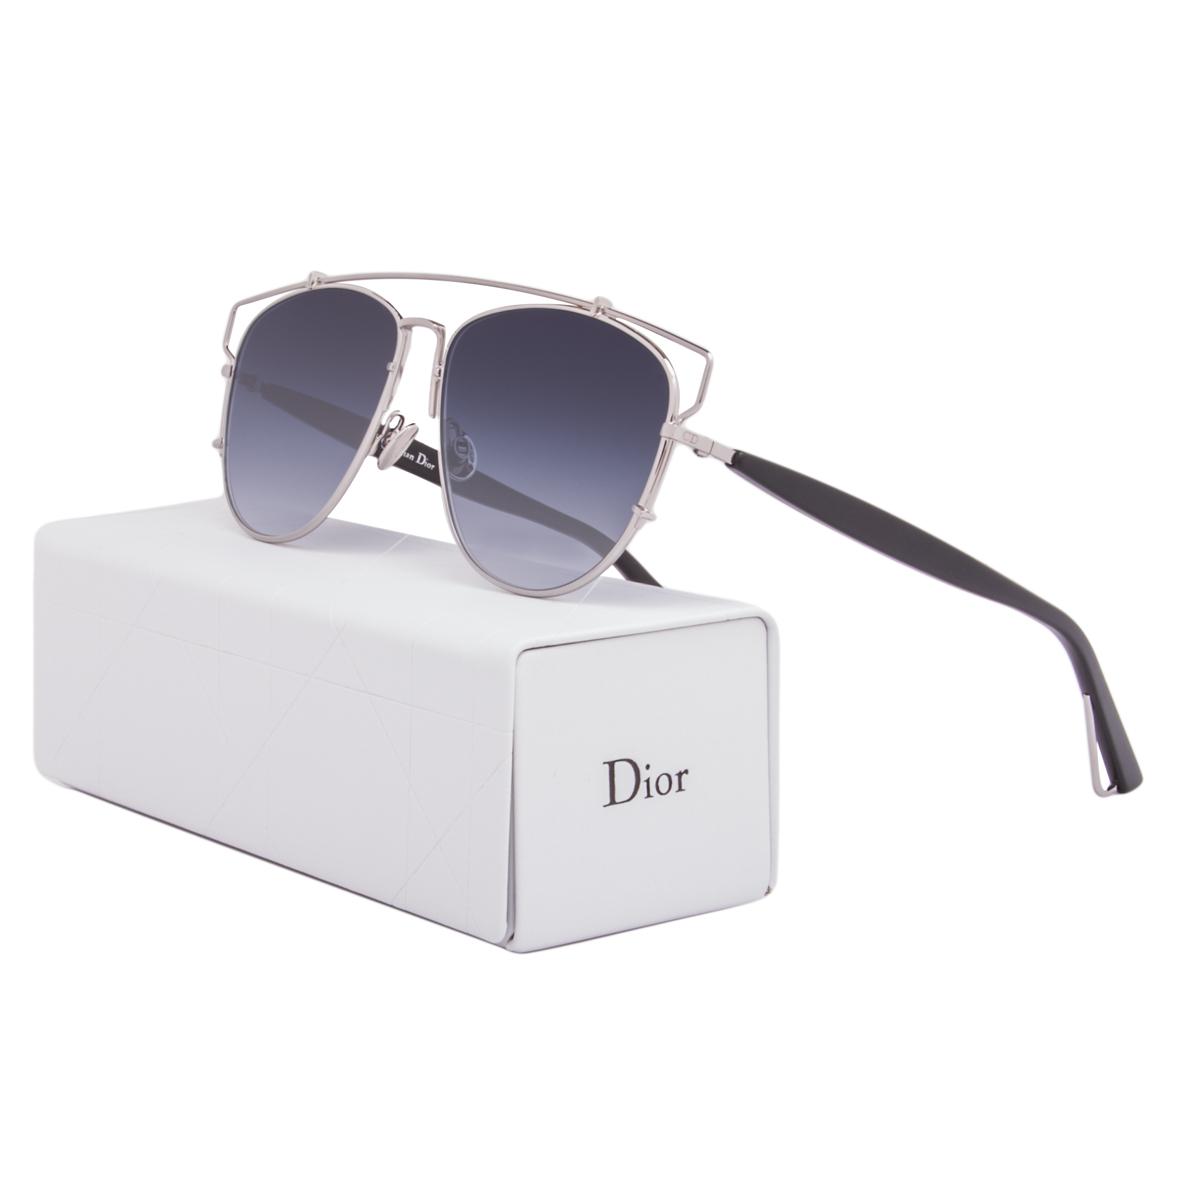 07b924acfe8e8 Dior Sunglasses Dior Technologic 84J84 Palladium Silver   Blue ...